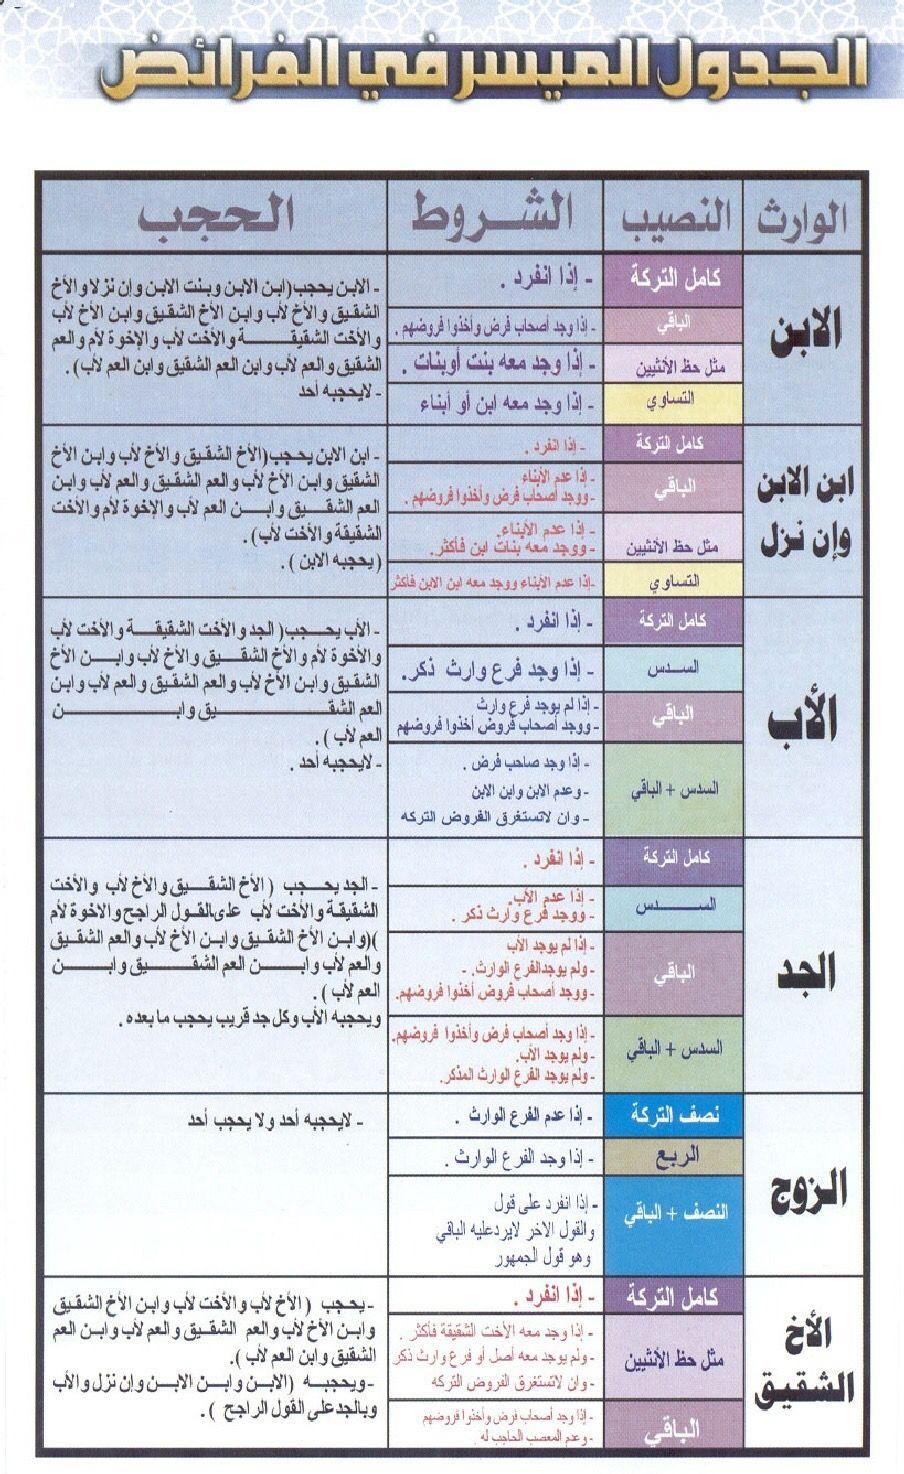 Pin By Mah Aed On Islamics إسلاميات Islam Facts Learn Islam Islam Beliefs